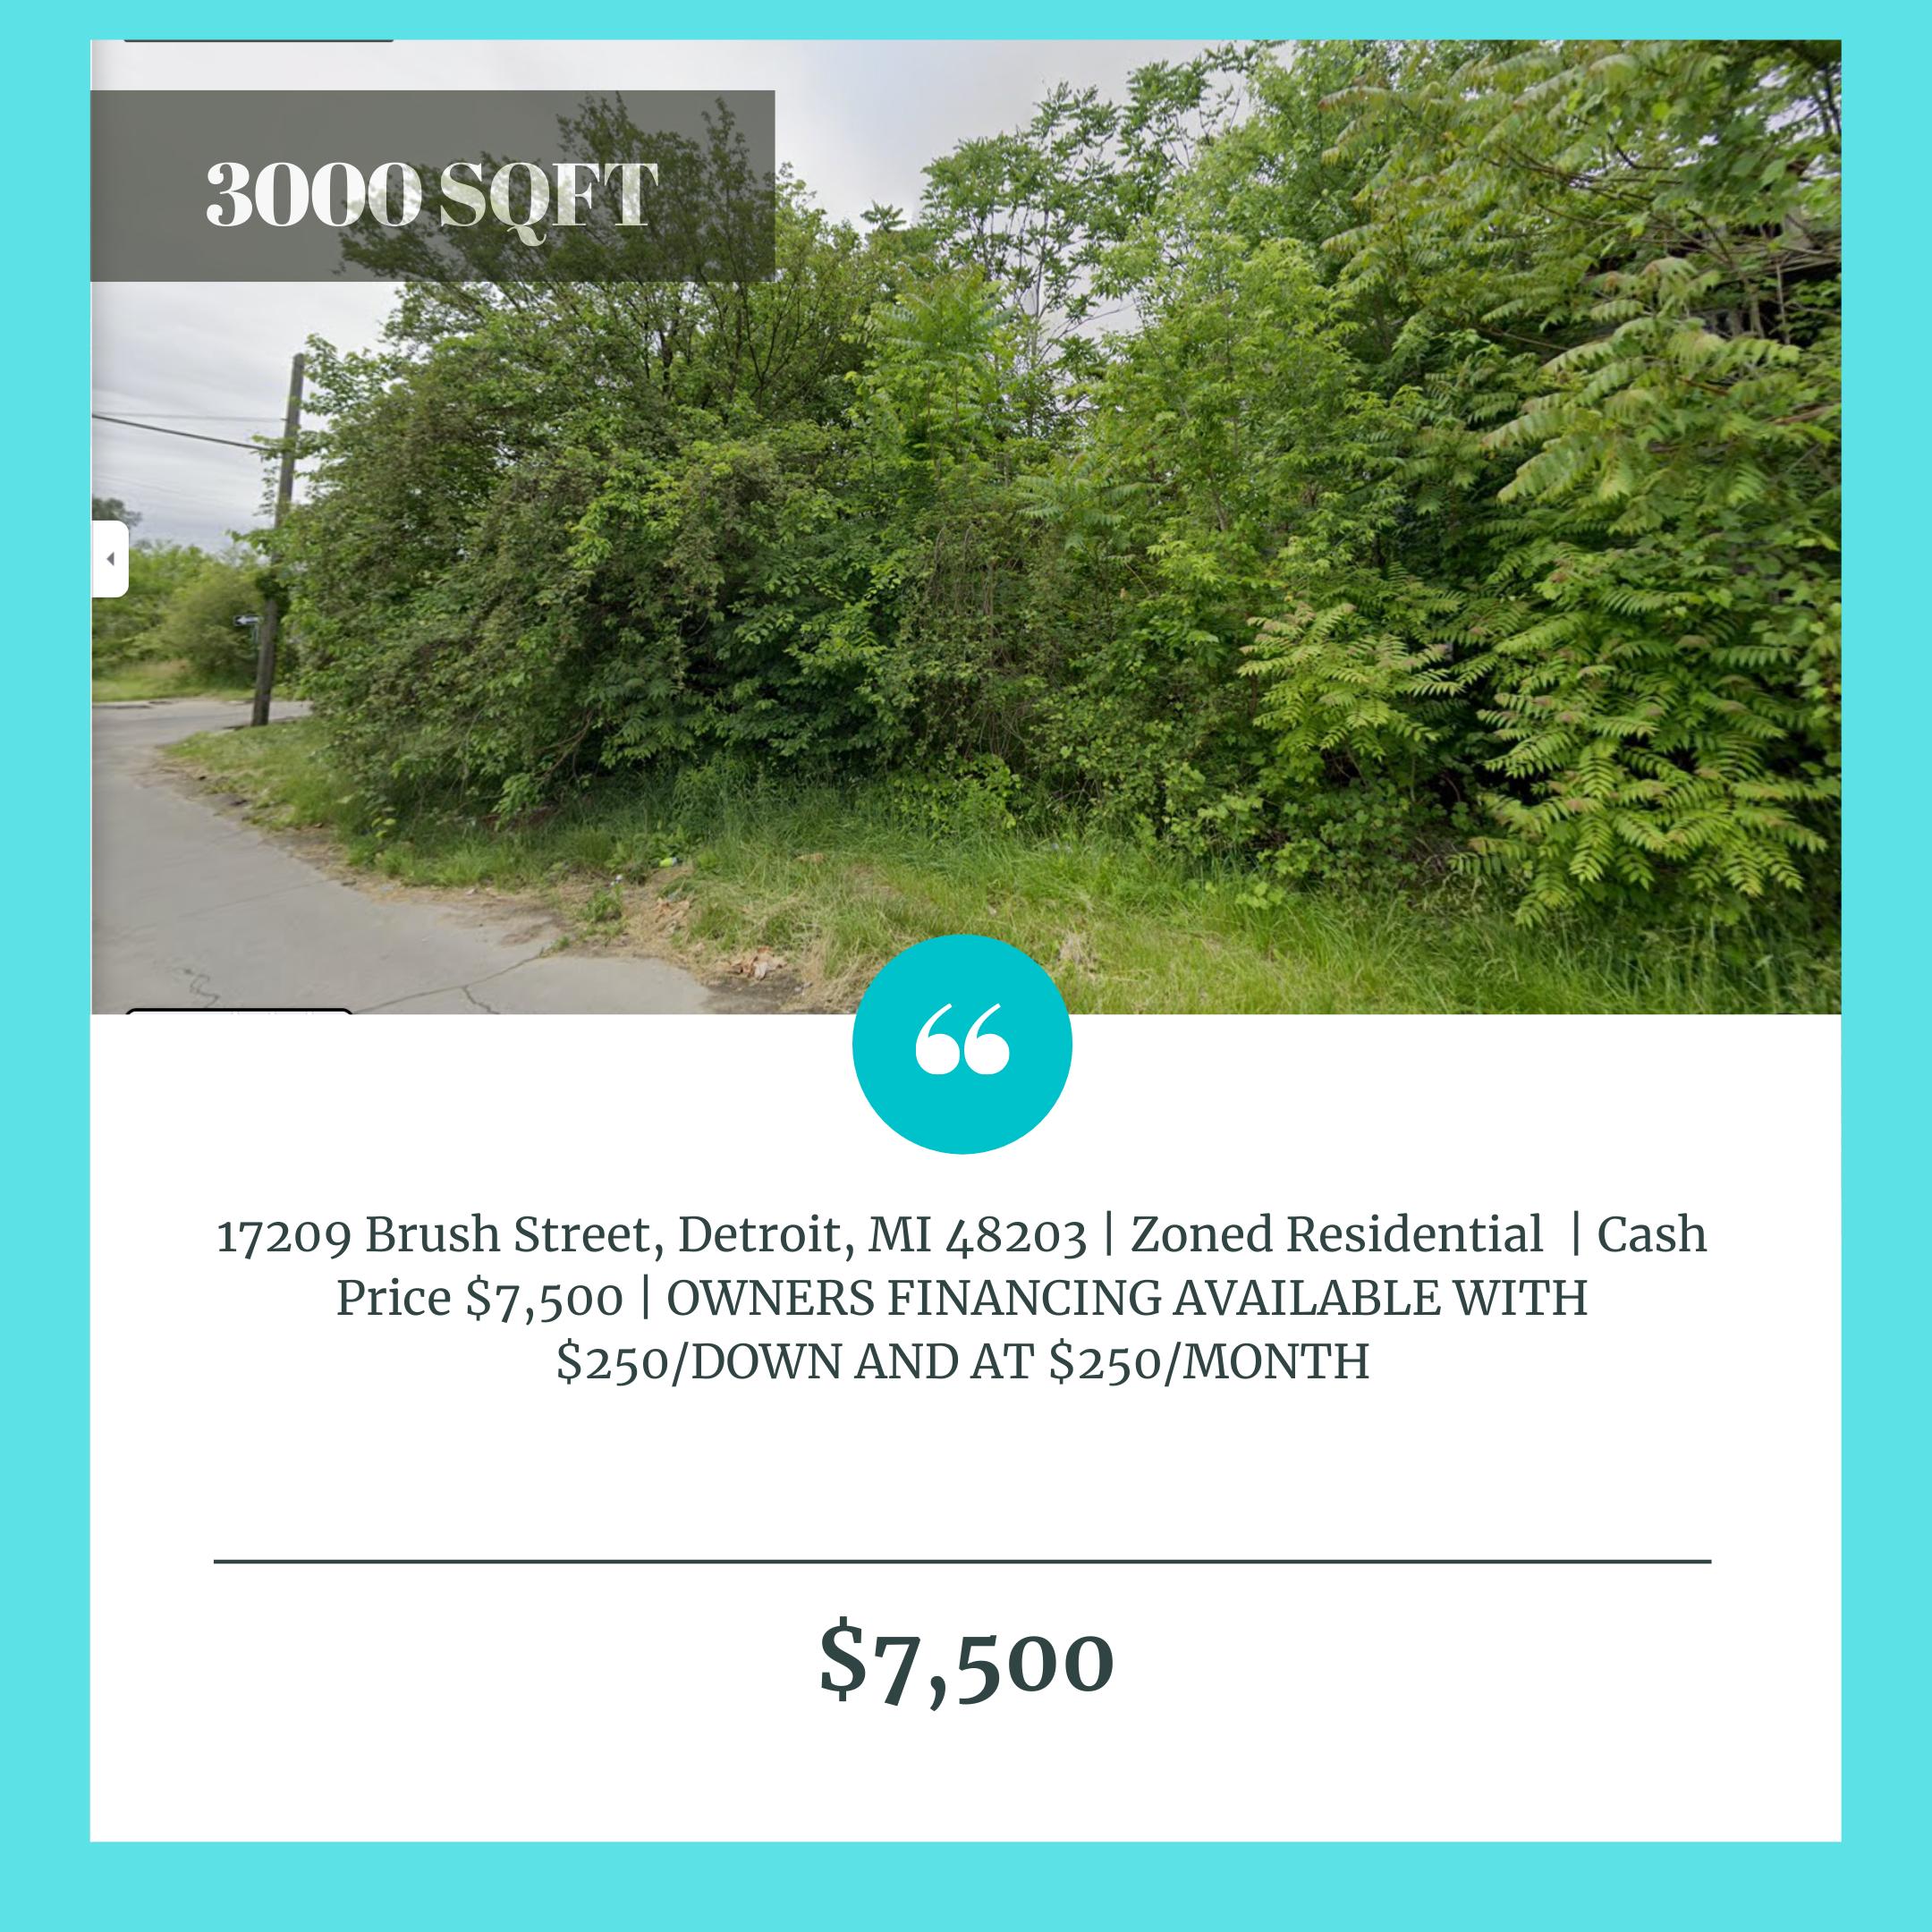 17209 Brush Street, Detroit, MI 48203